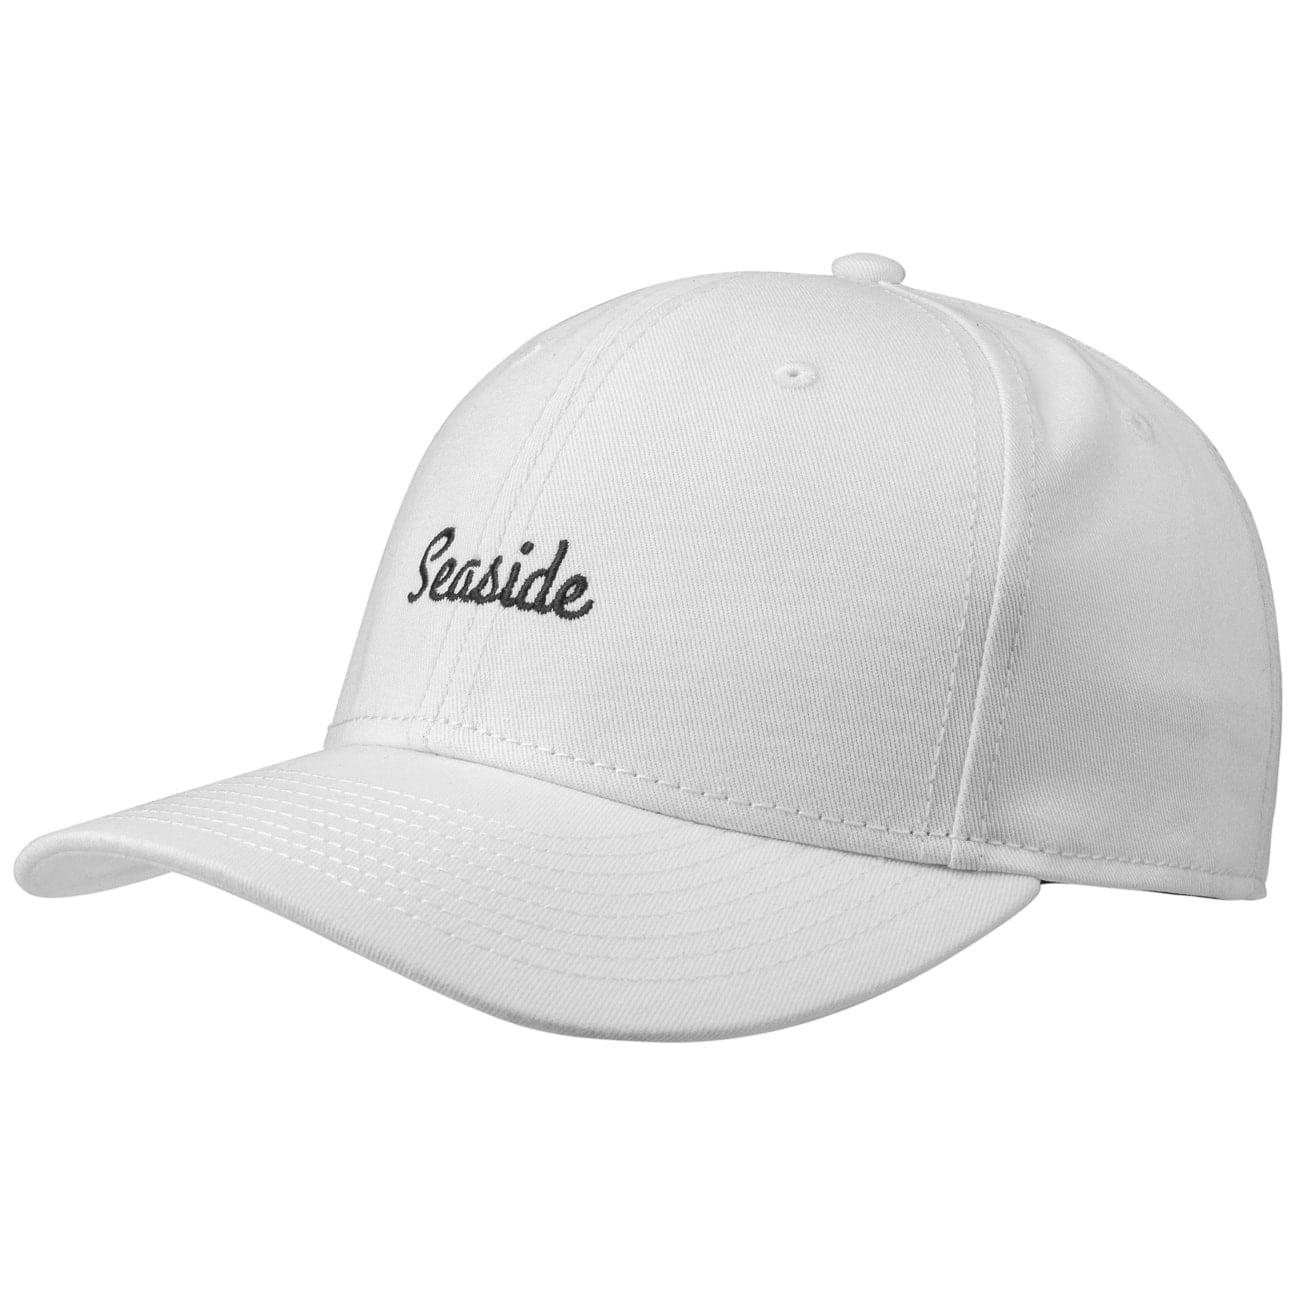 Casquette Seaside Strapback by Wemoto  baseball cap